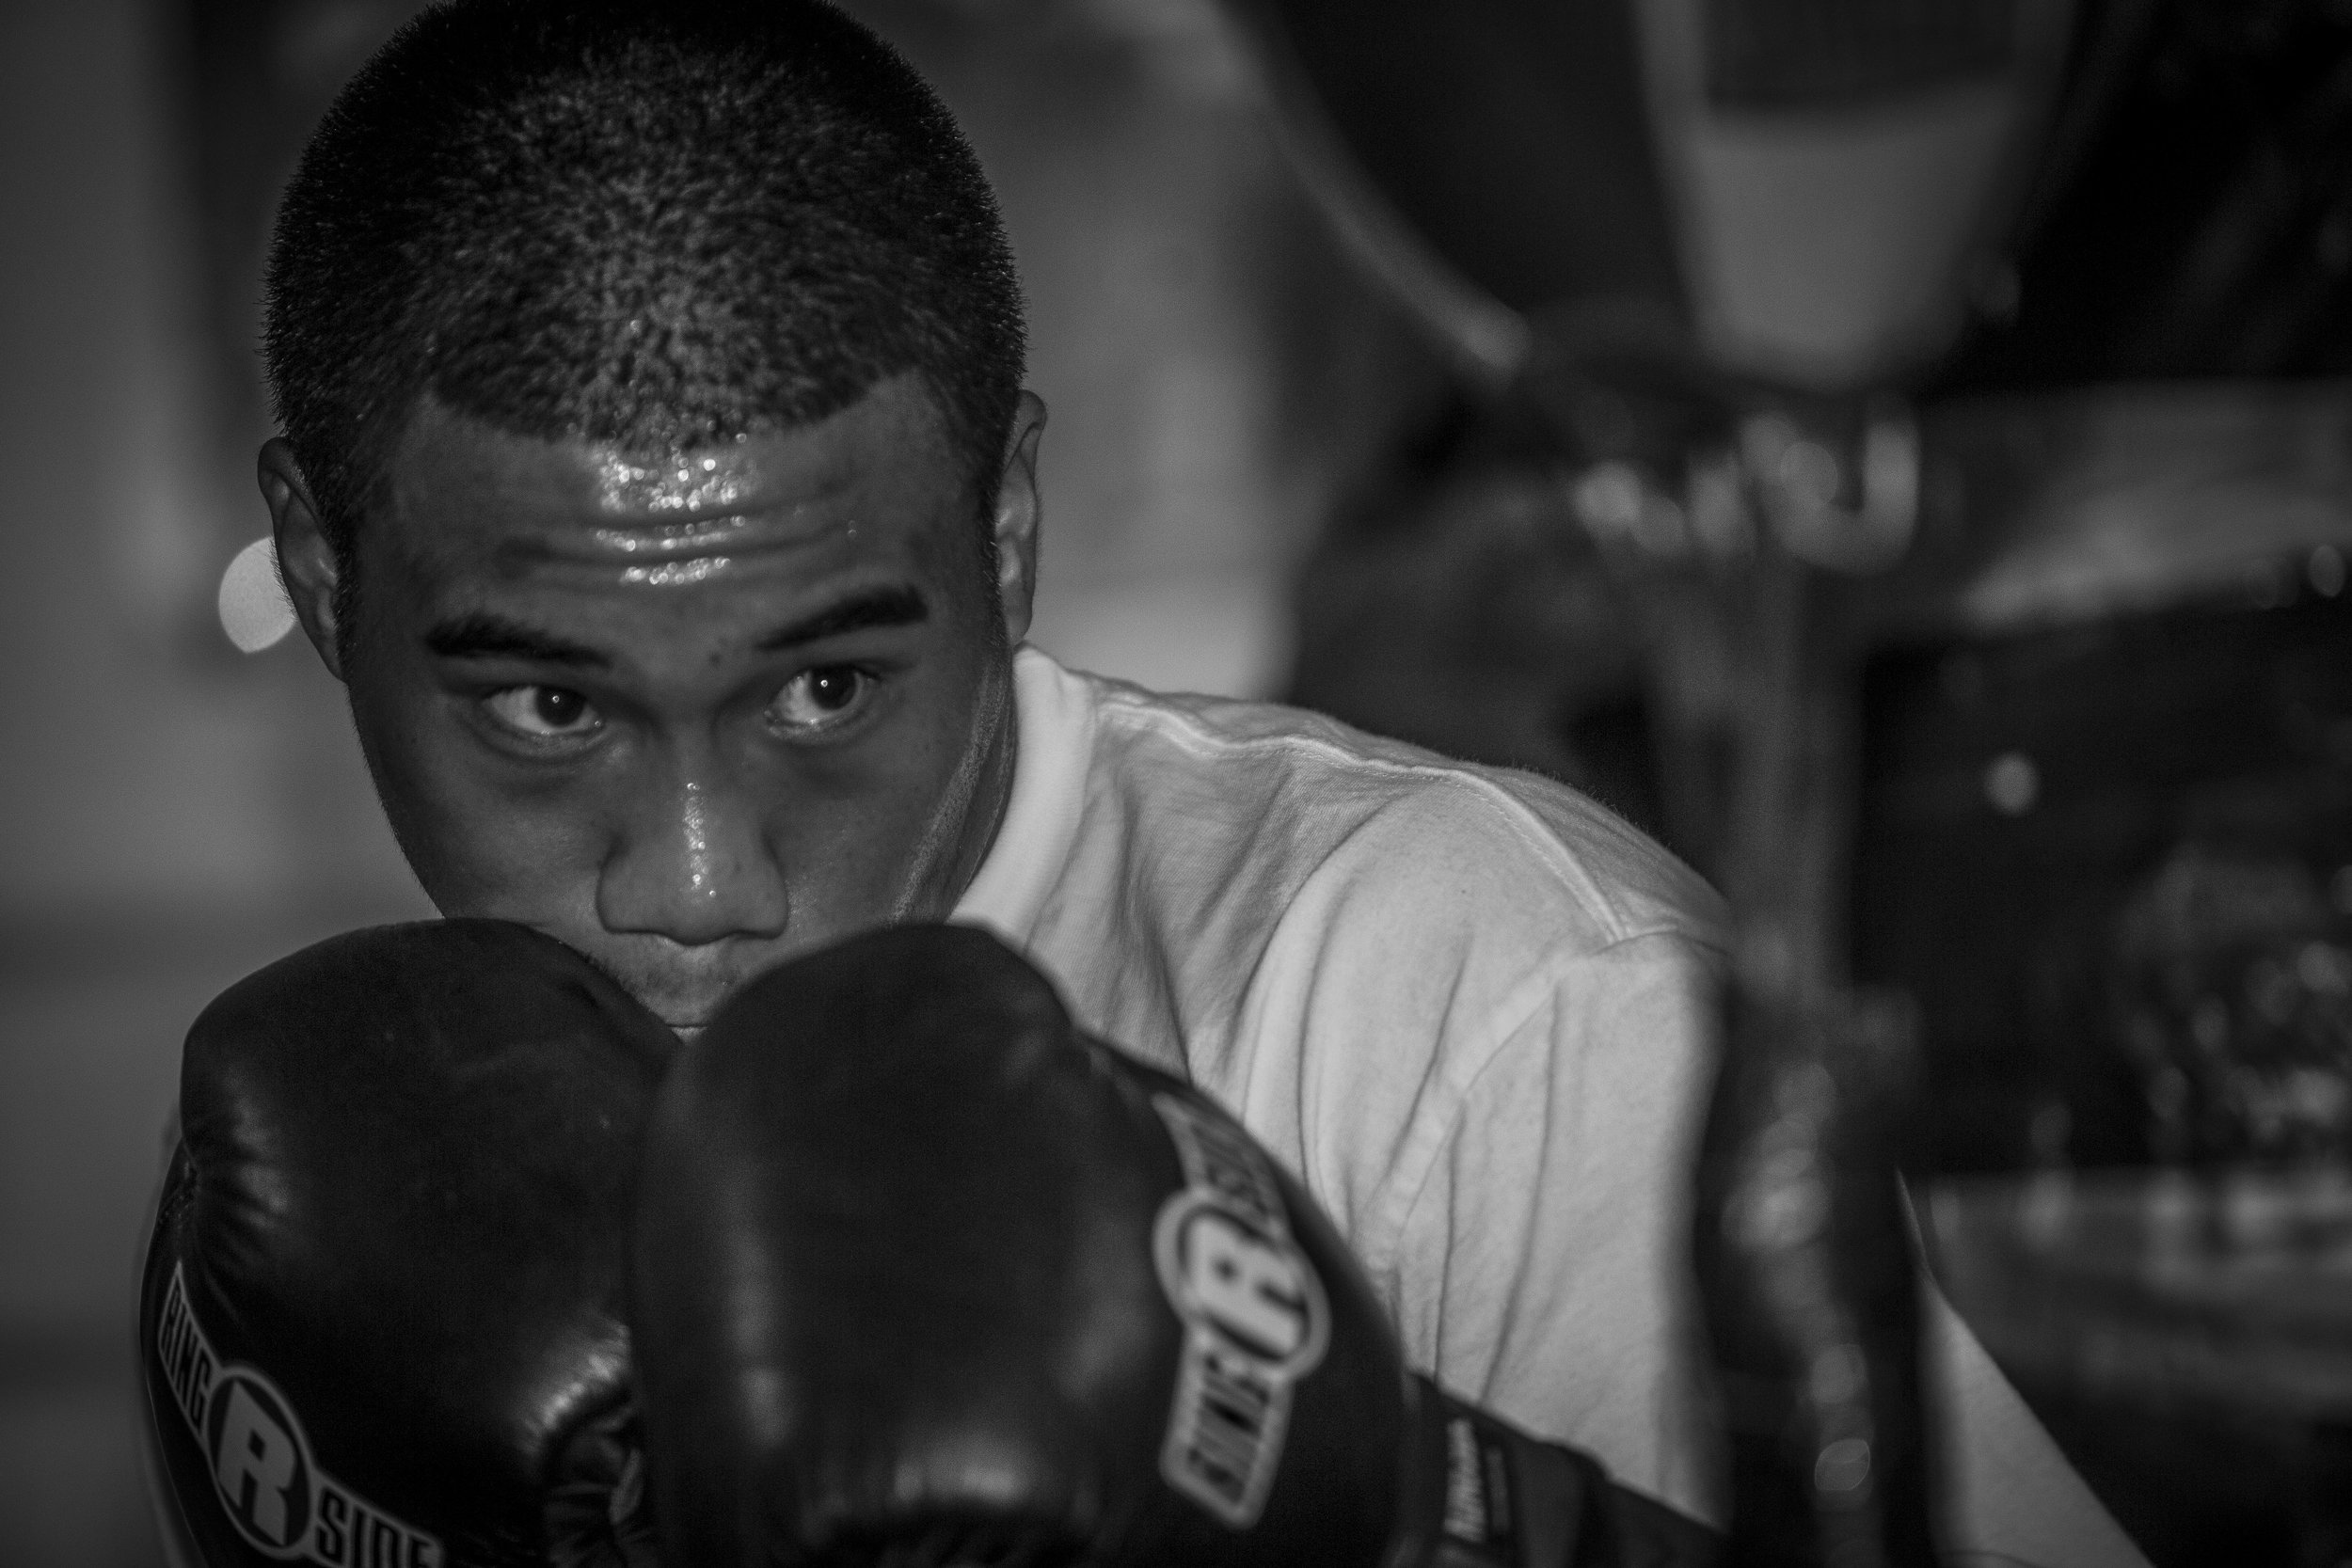 BowyerD_Thur_Boxing-3-2.jpg